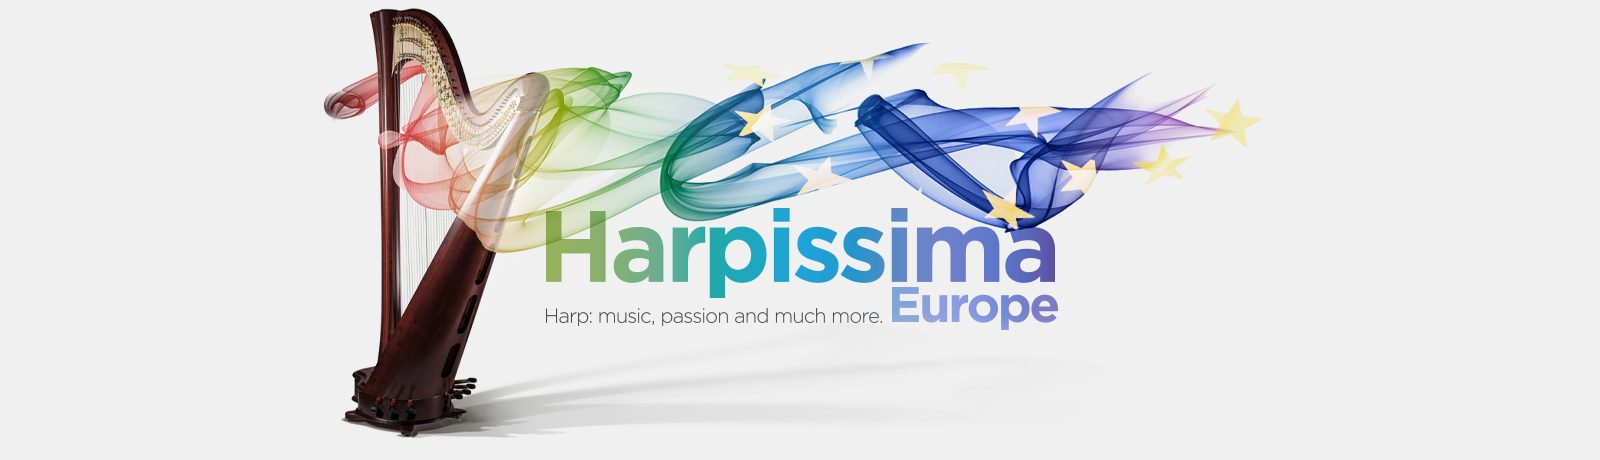 Harpissima Europe